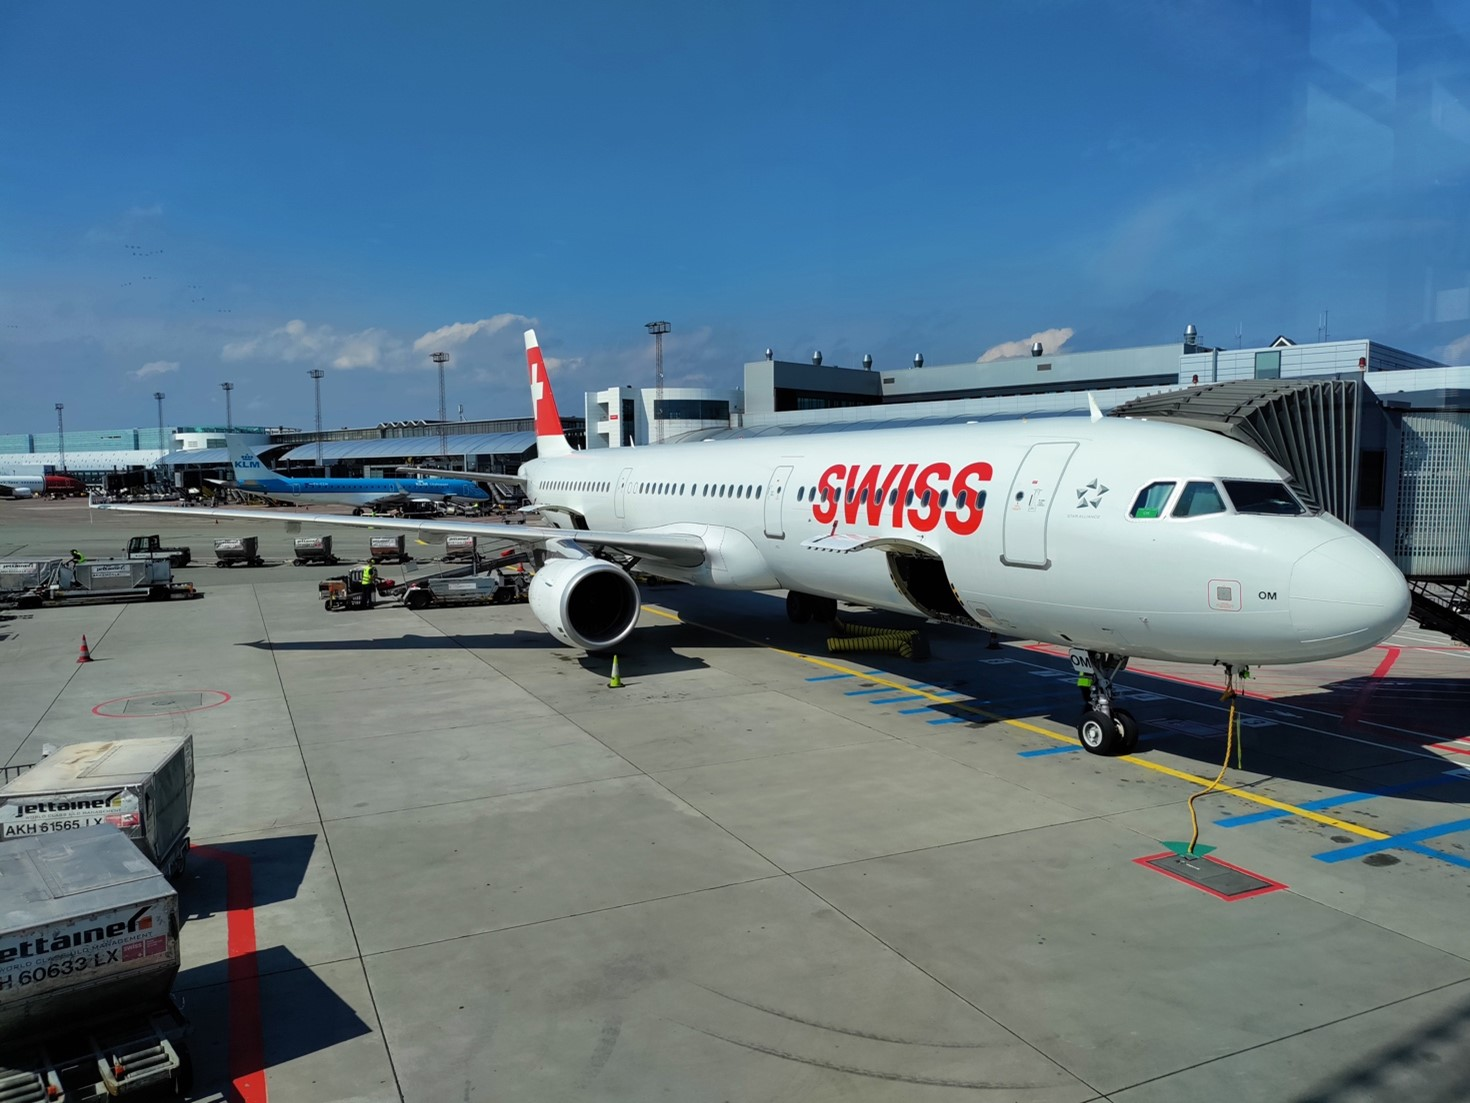 Flot bemaling på SWISS Airbus A321. (Foto: Matthias Wagner)